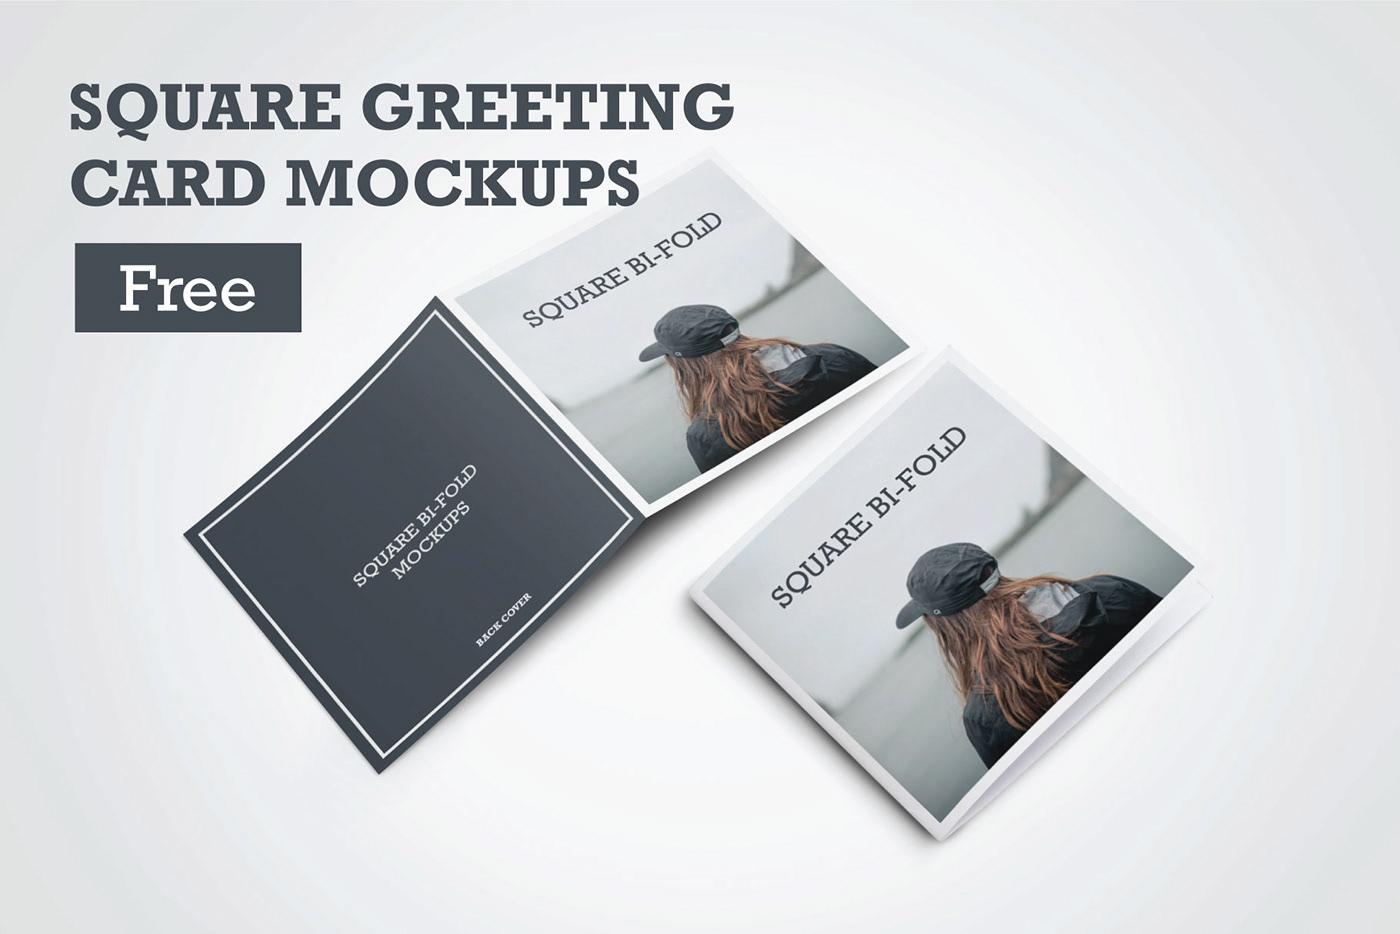 free free download freebies greeting card Invitation Birthday Event Product Display photoshop creative